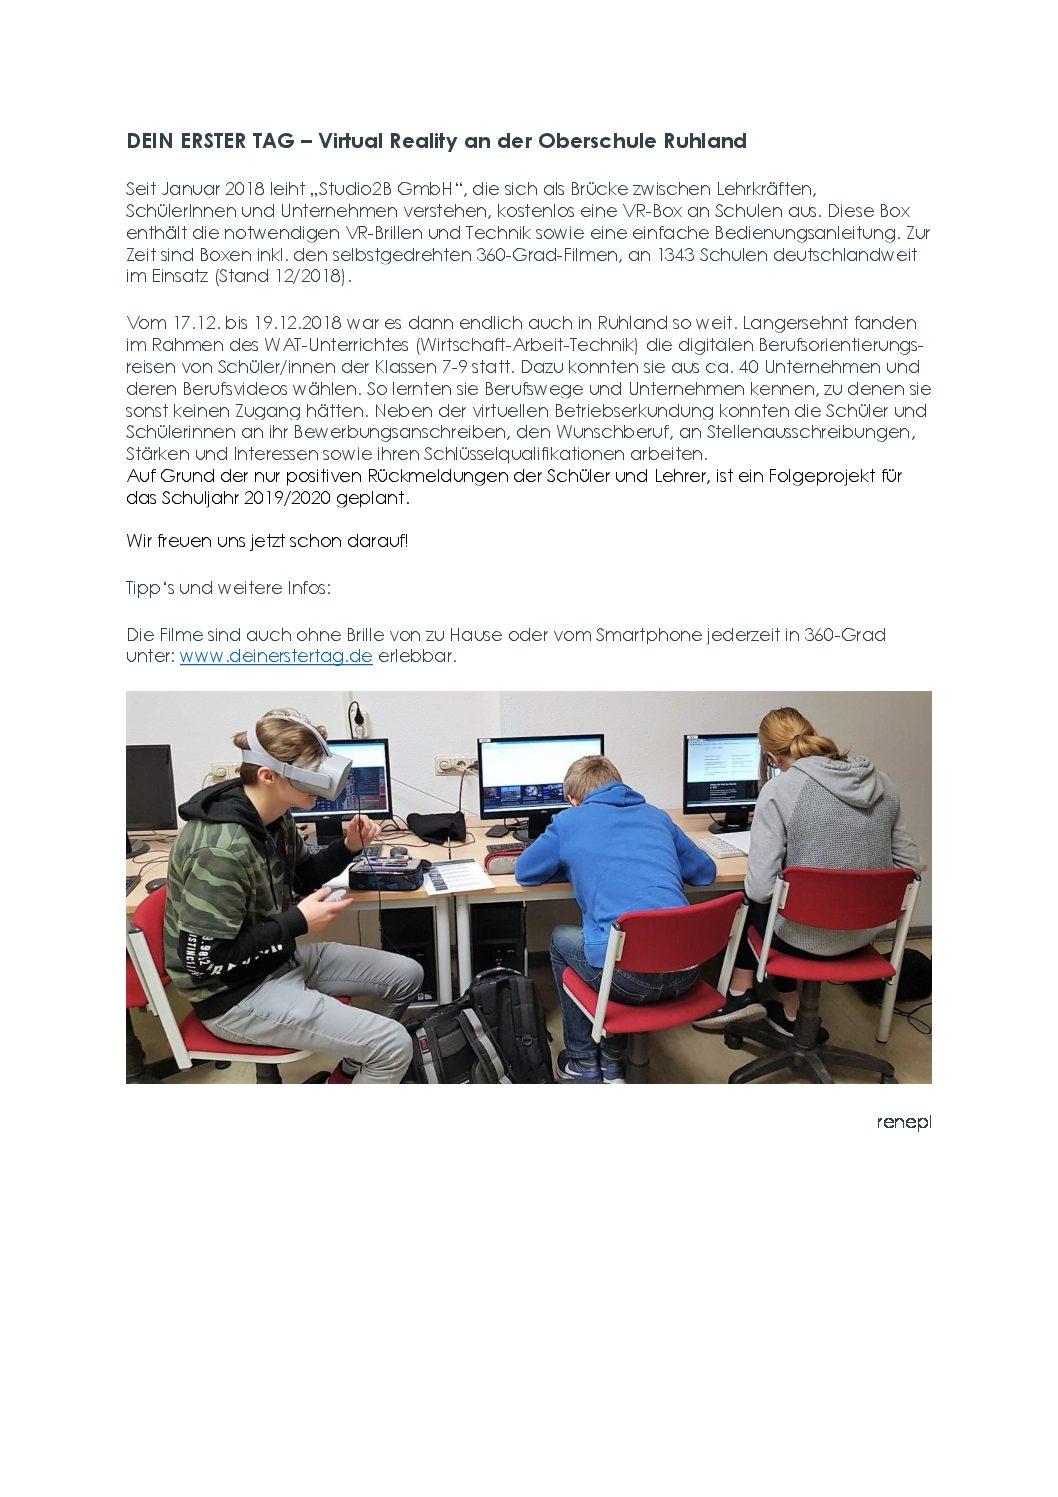 http://www.schuleruhland.de/wp-content/uploads/2019/01/DEIN-ERSTER-TAG_Presse-_-HP_OSR-1-pdf.jpg